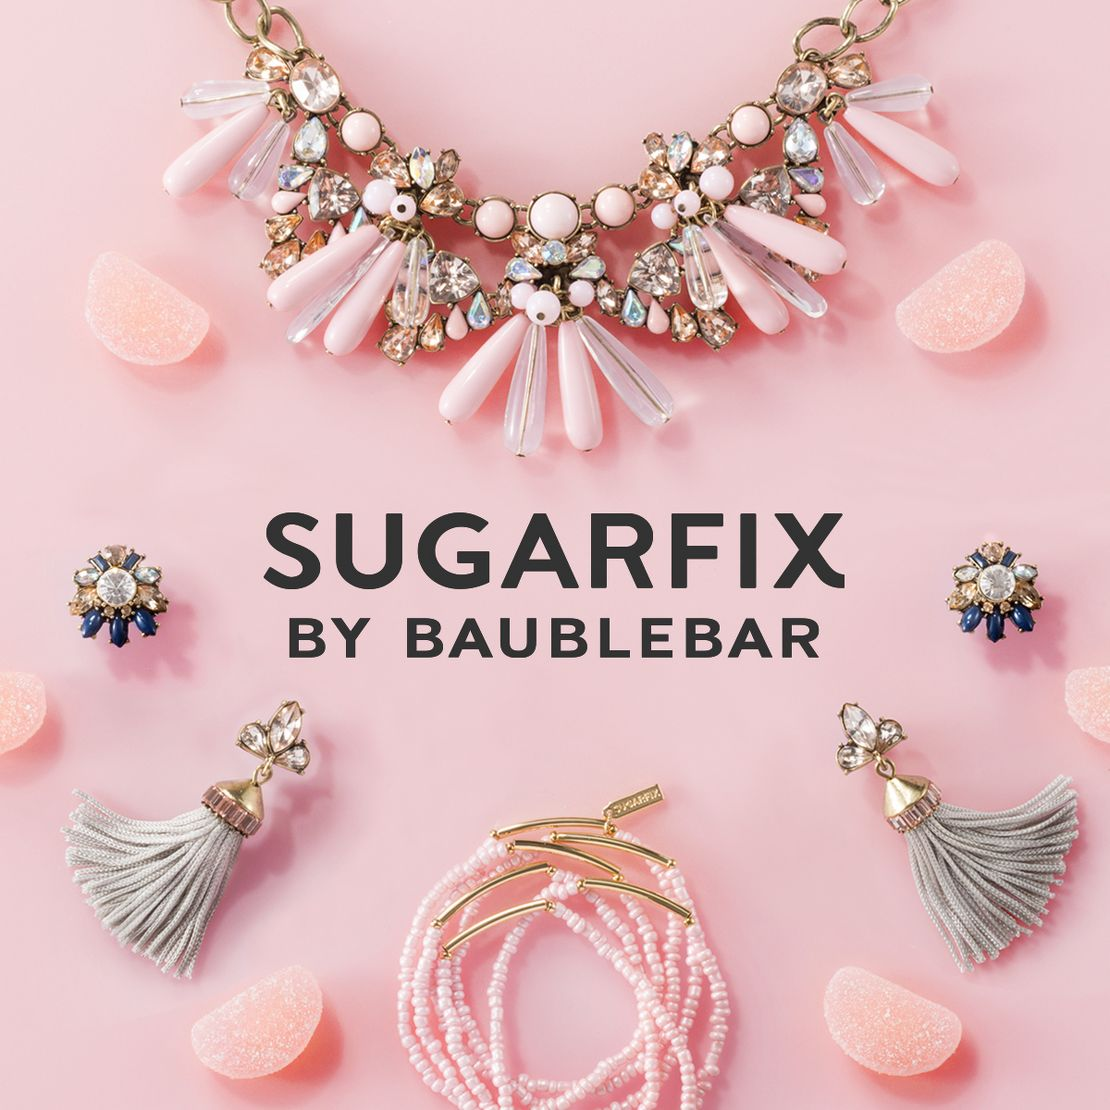 Sugarfix By Baublebar